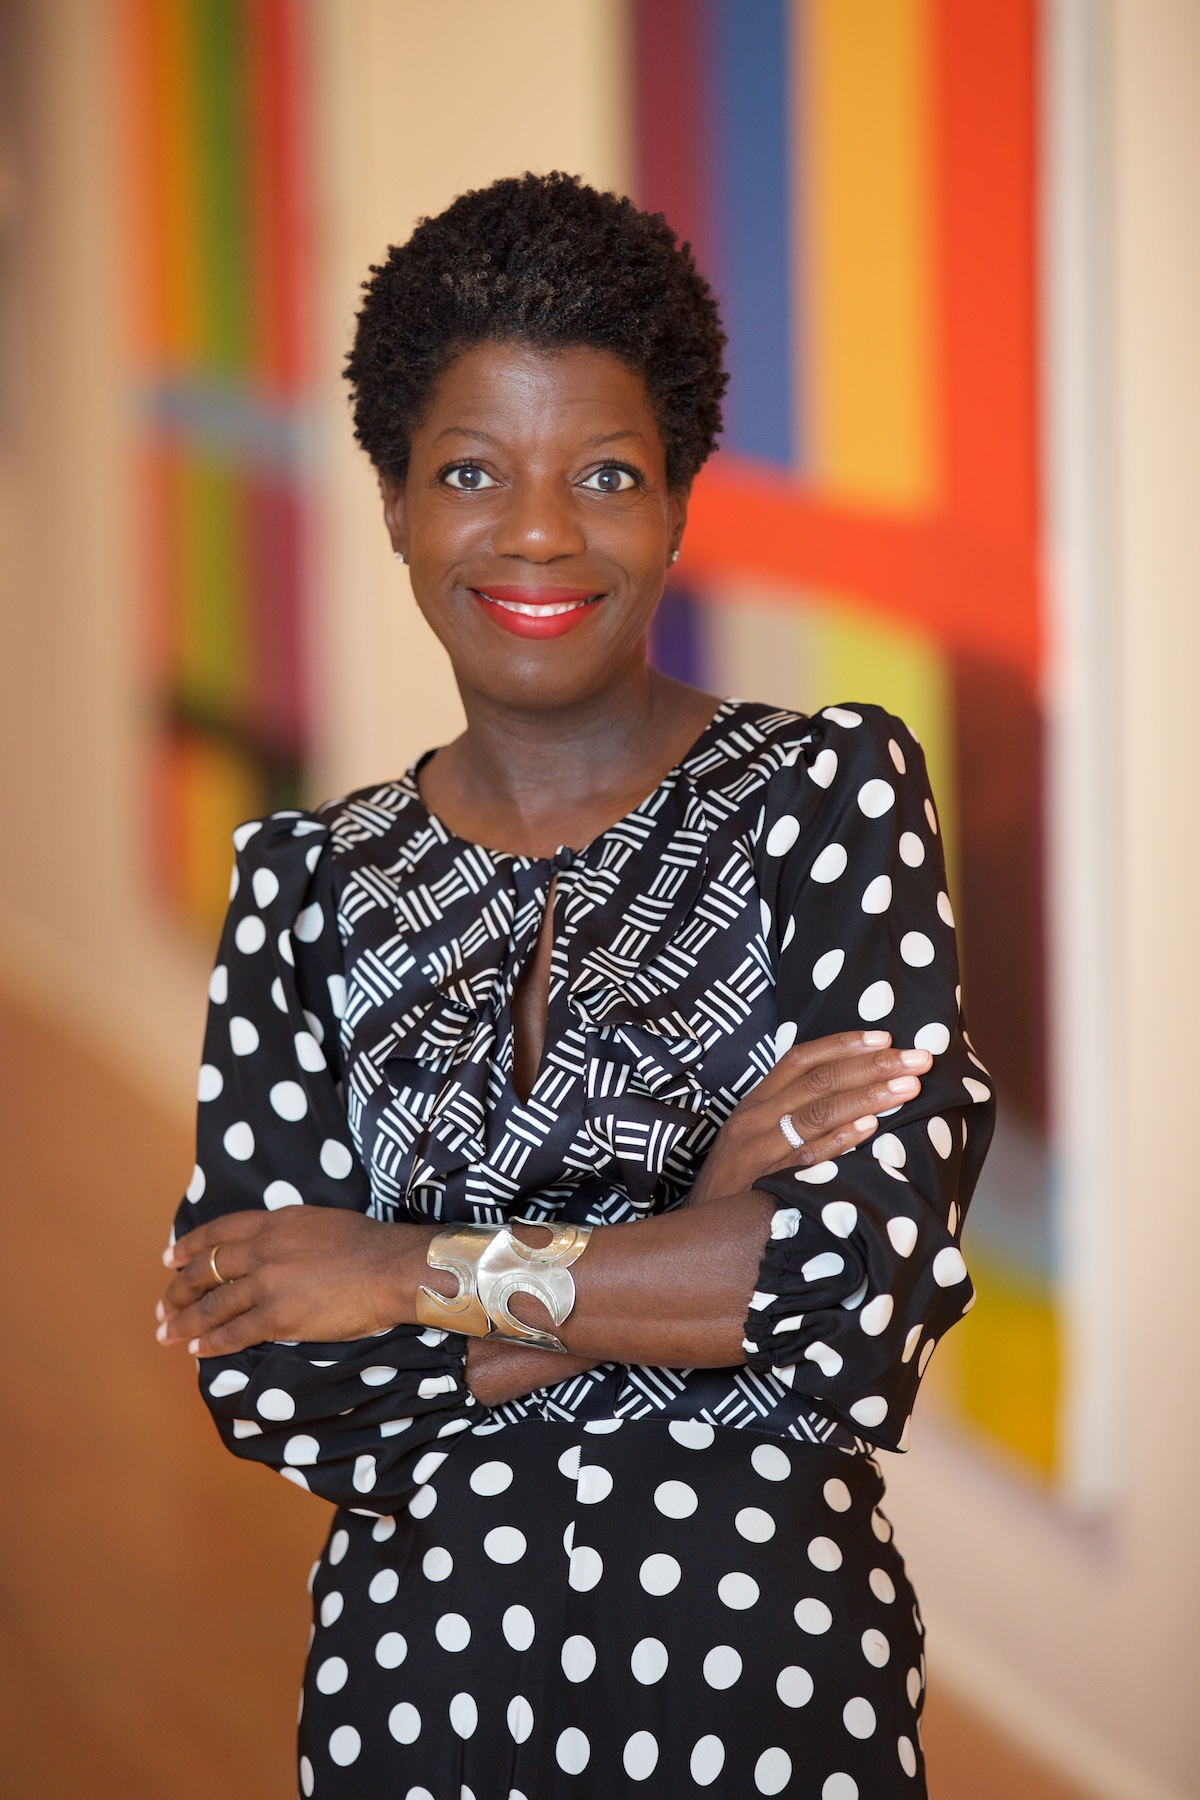 Studio Museum Director Thelma Golden Joins Board of Los Angeles